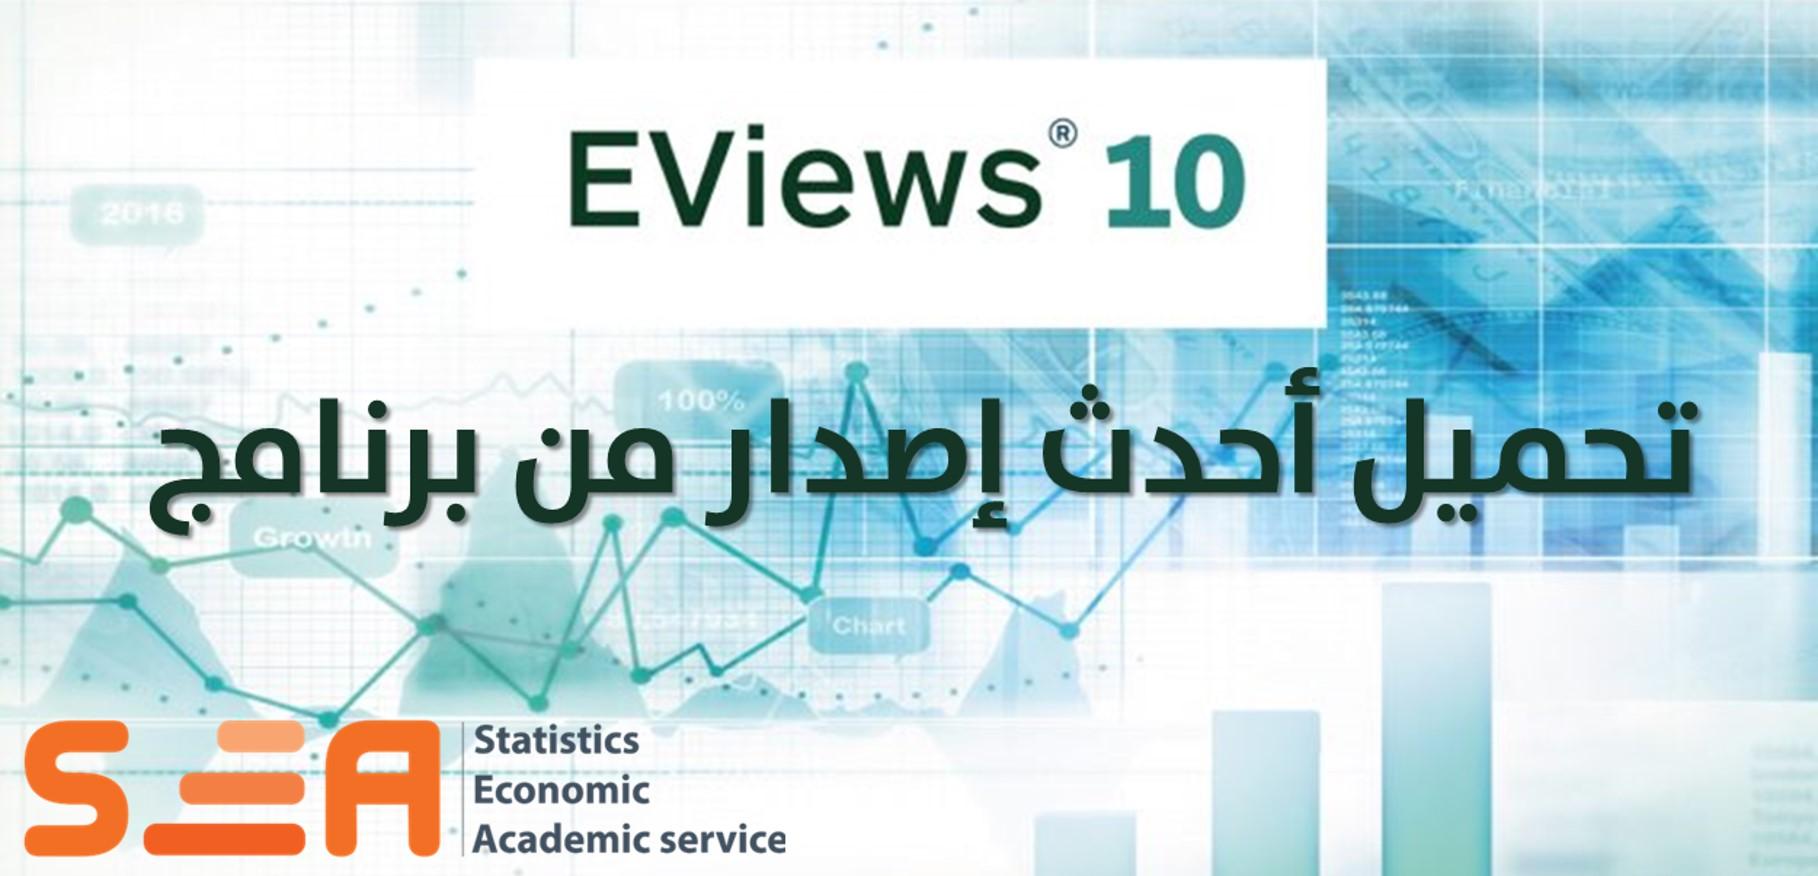 تحميل برنامج Eviews 10 مجانا